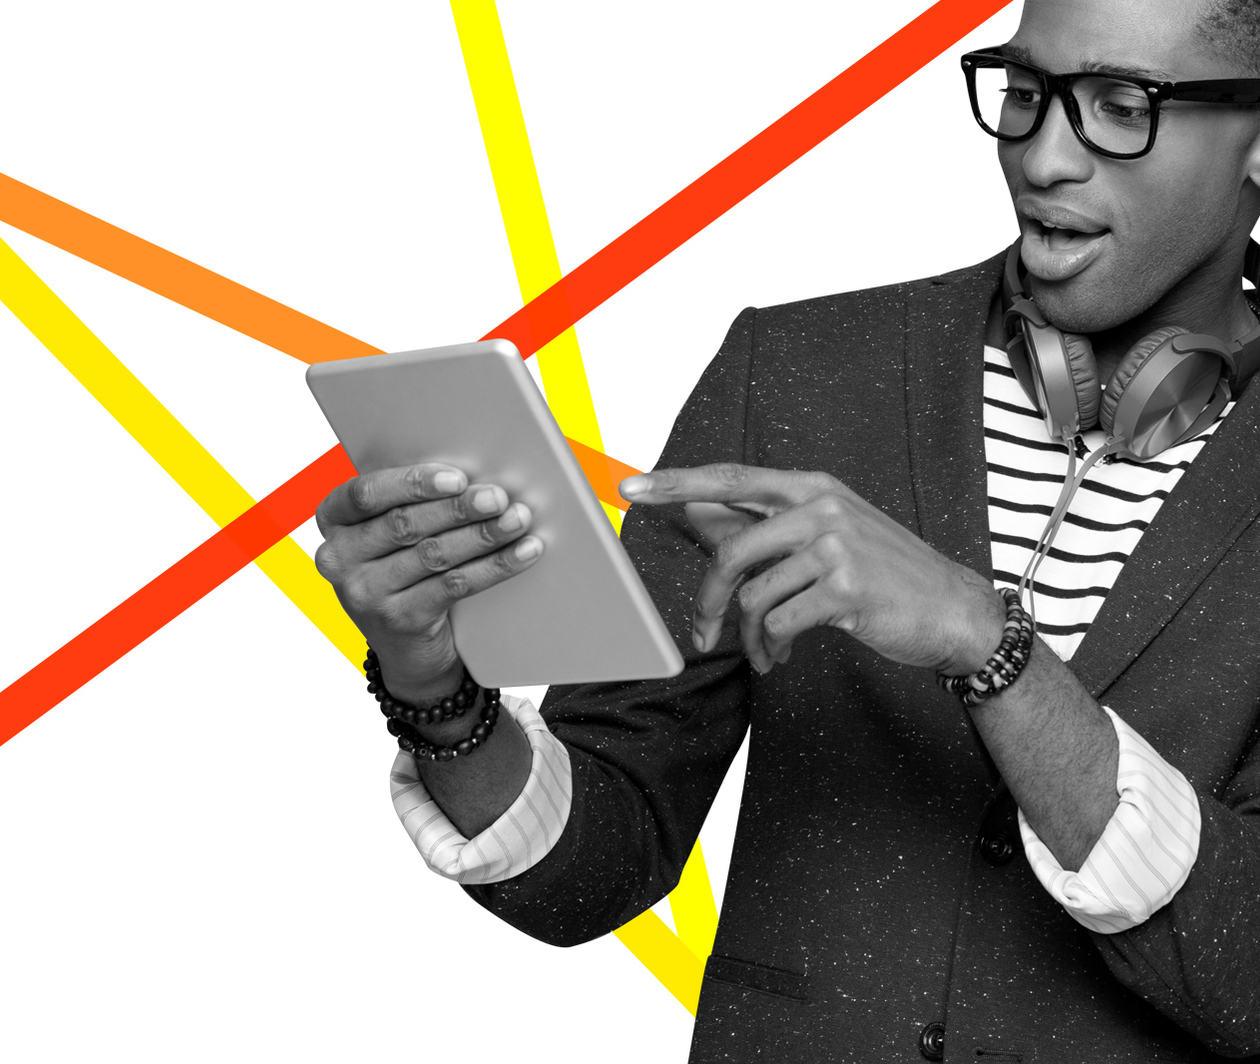 Digital Skills: Digital Skills for Work and Life